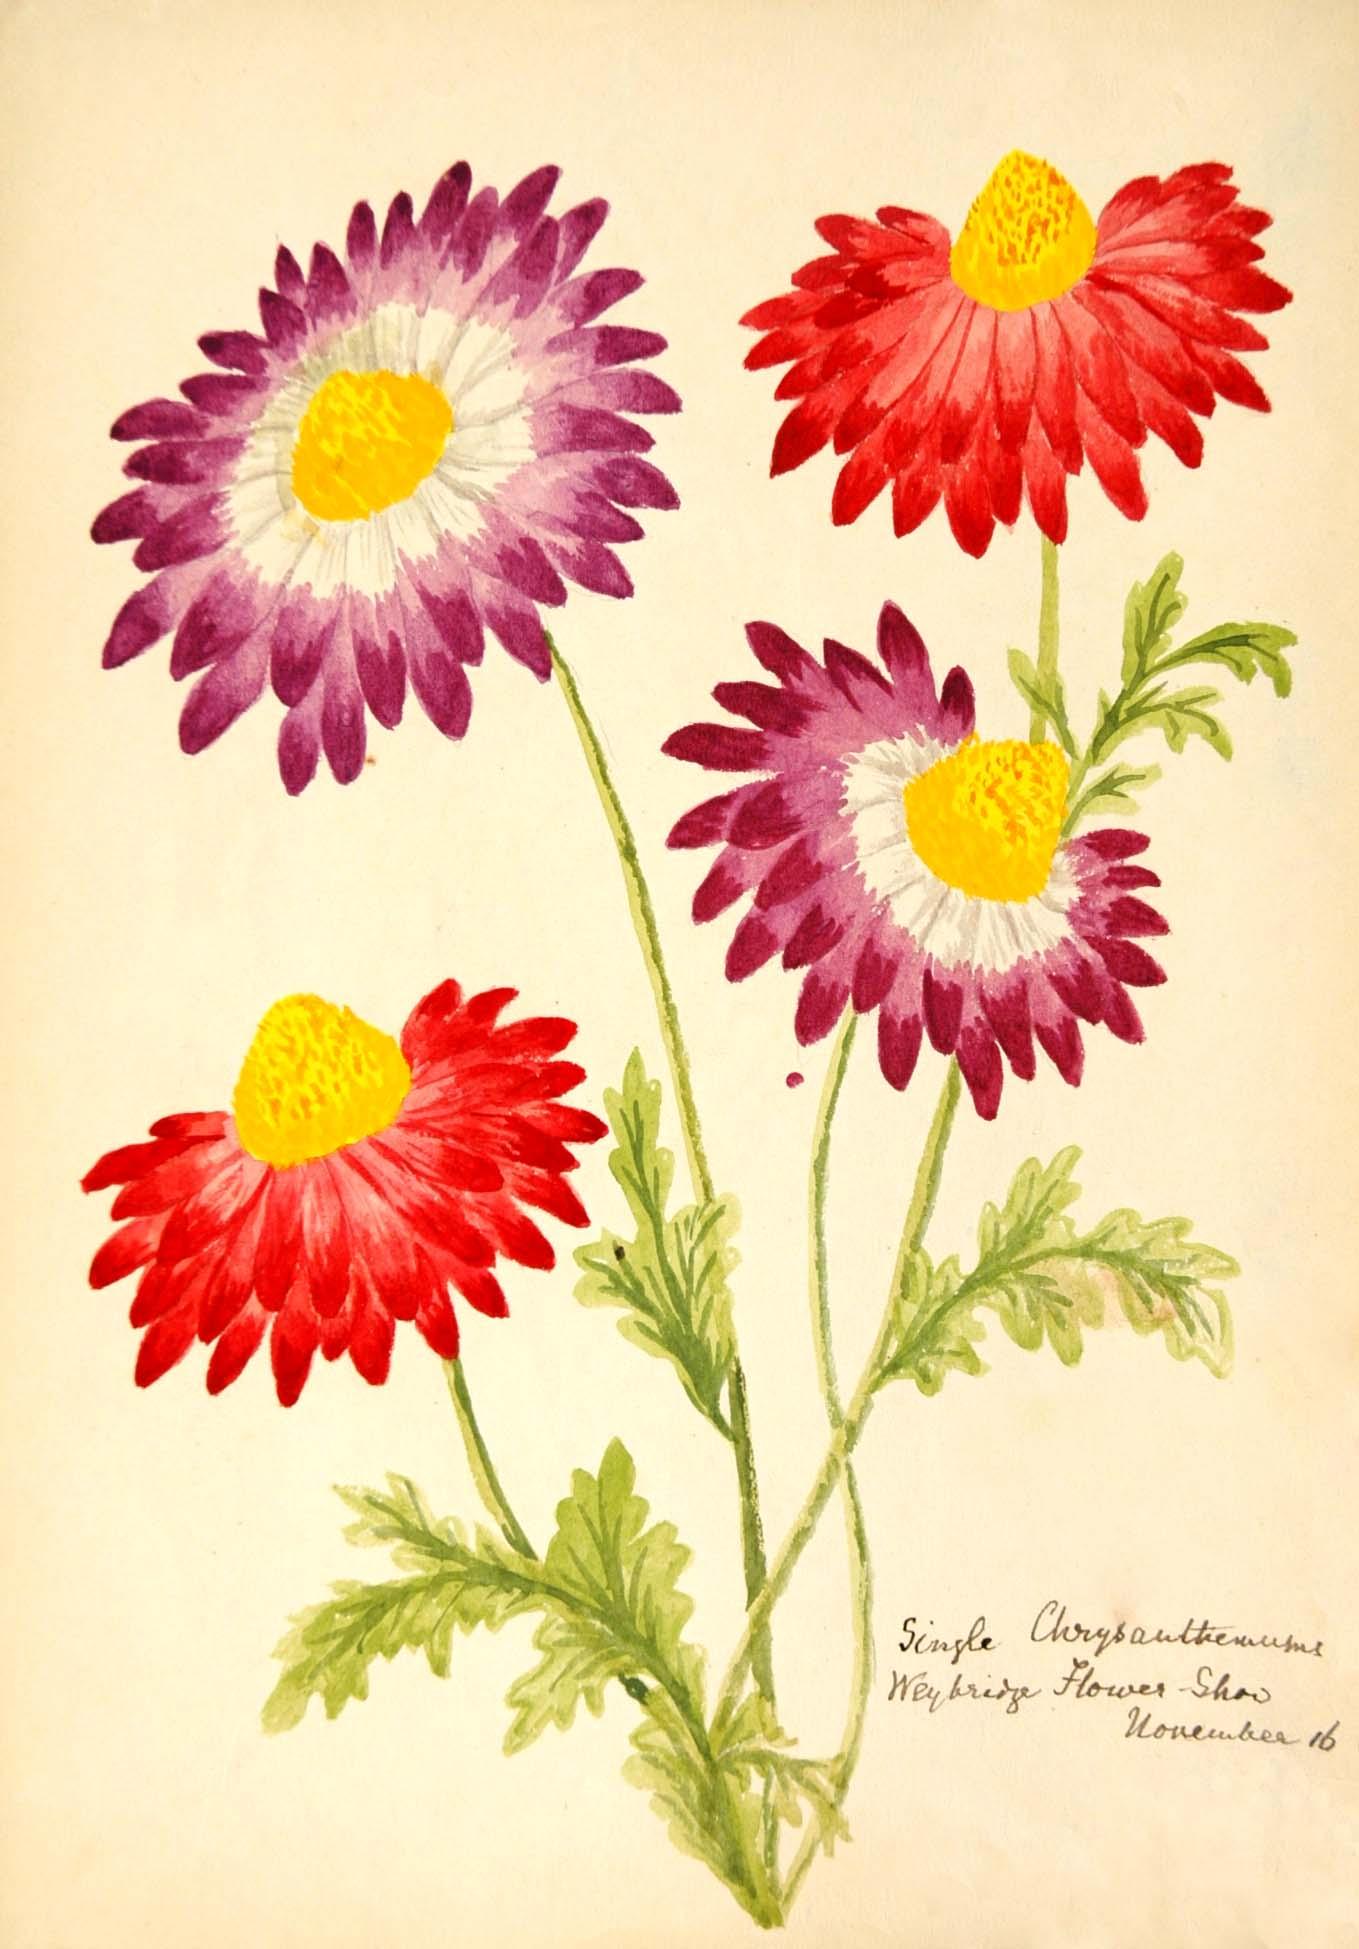 2.1929.2 Image of Single Chrysanthemums, Weybridge Flower Show